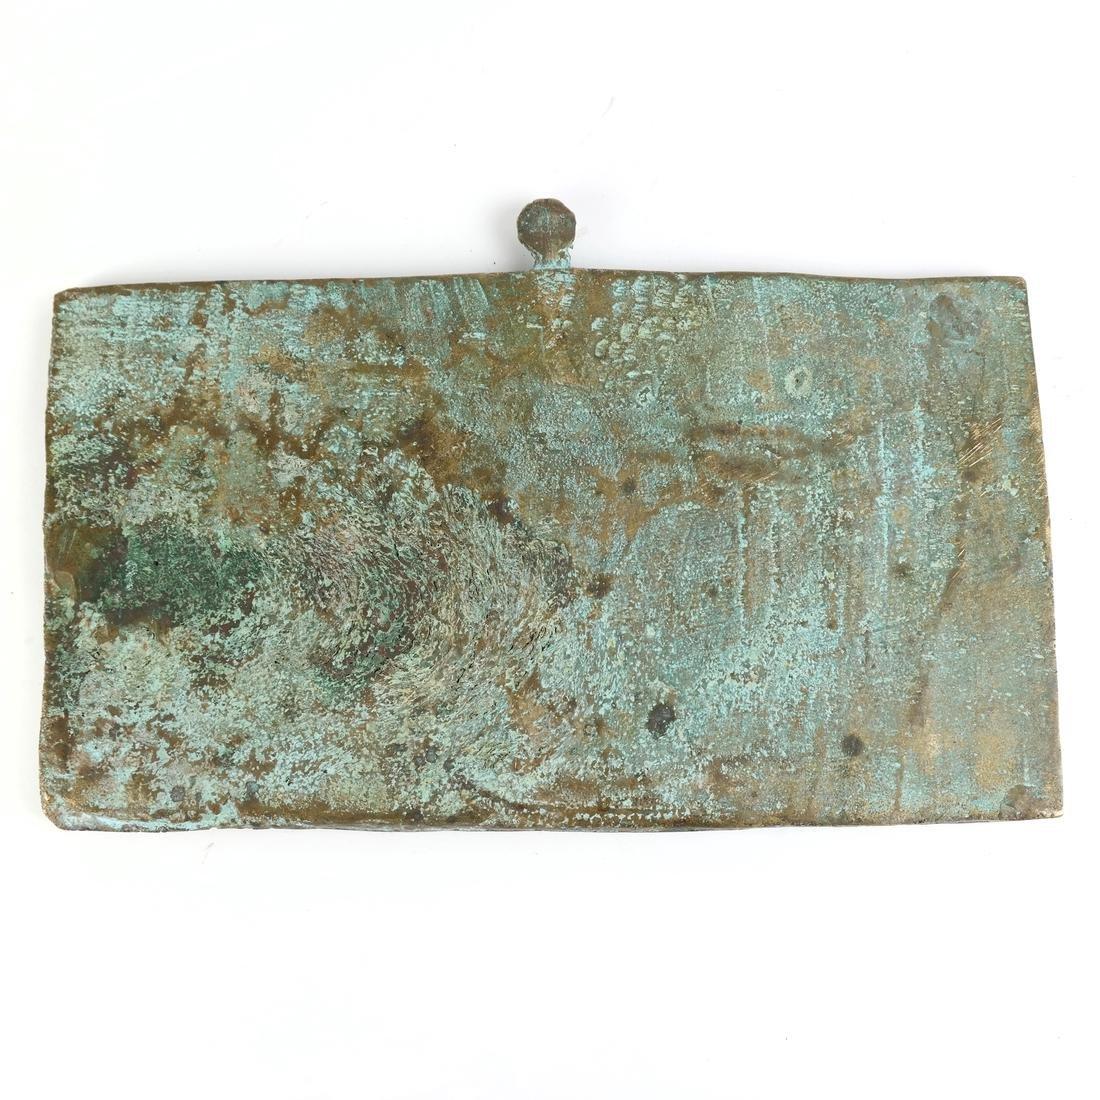 Contemporary African Bronze Plaque - 3